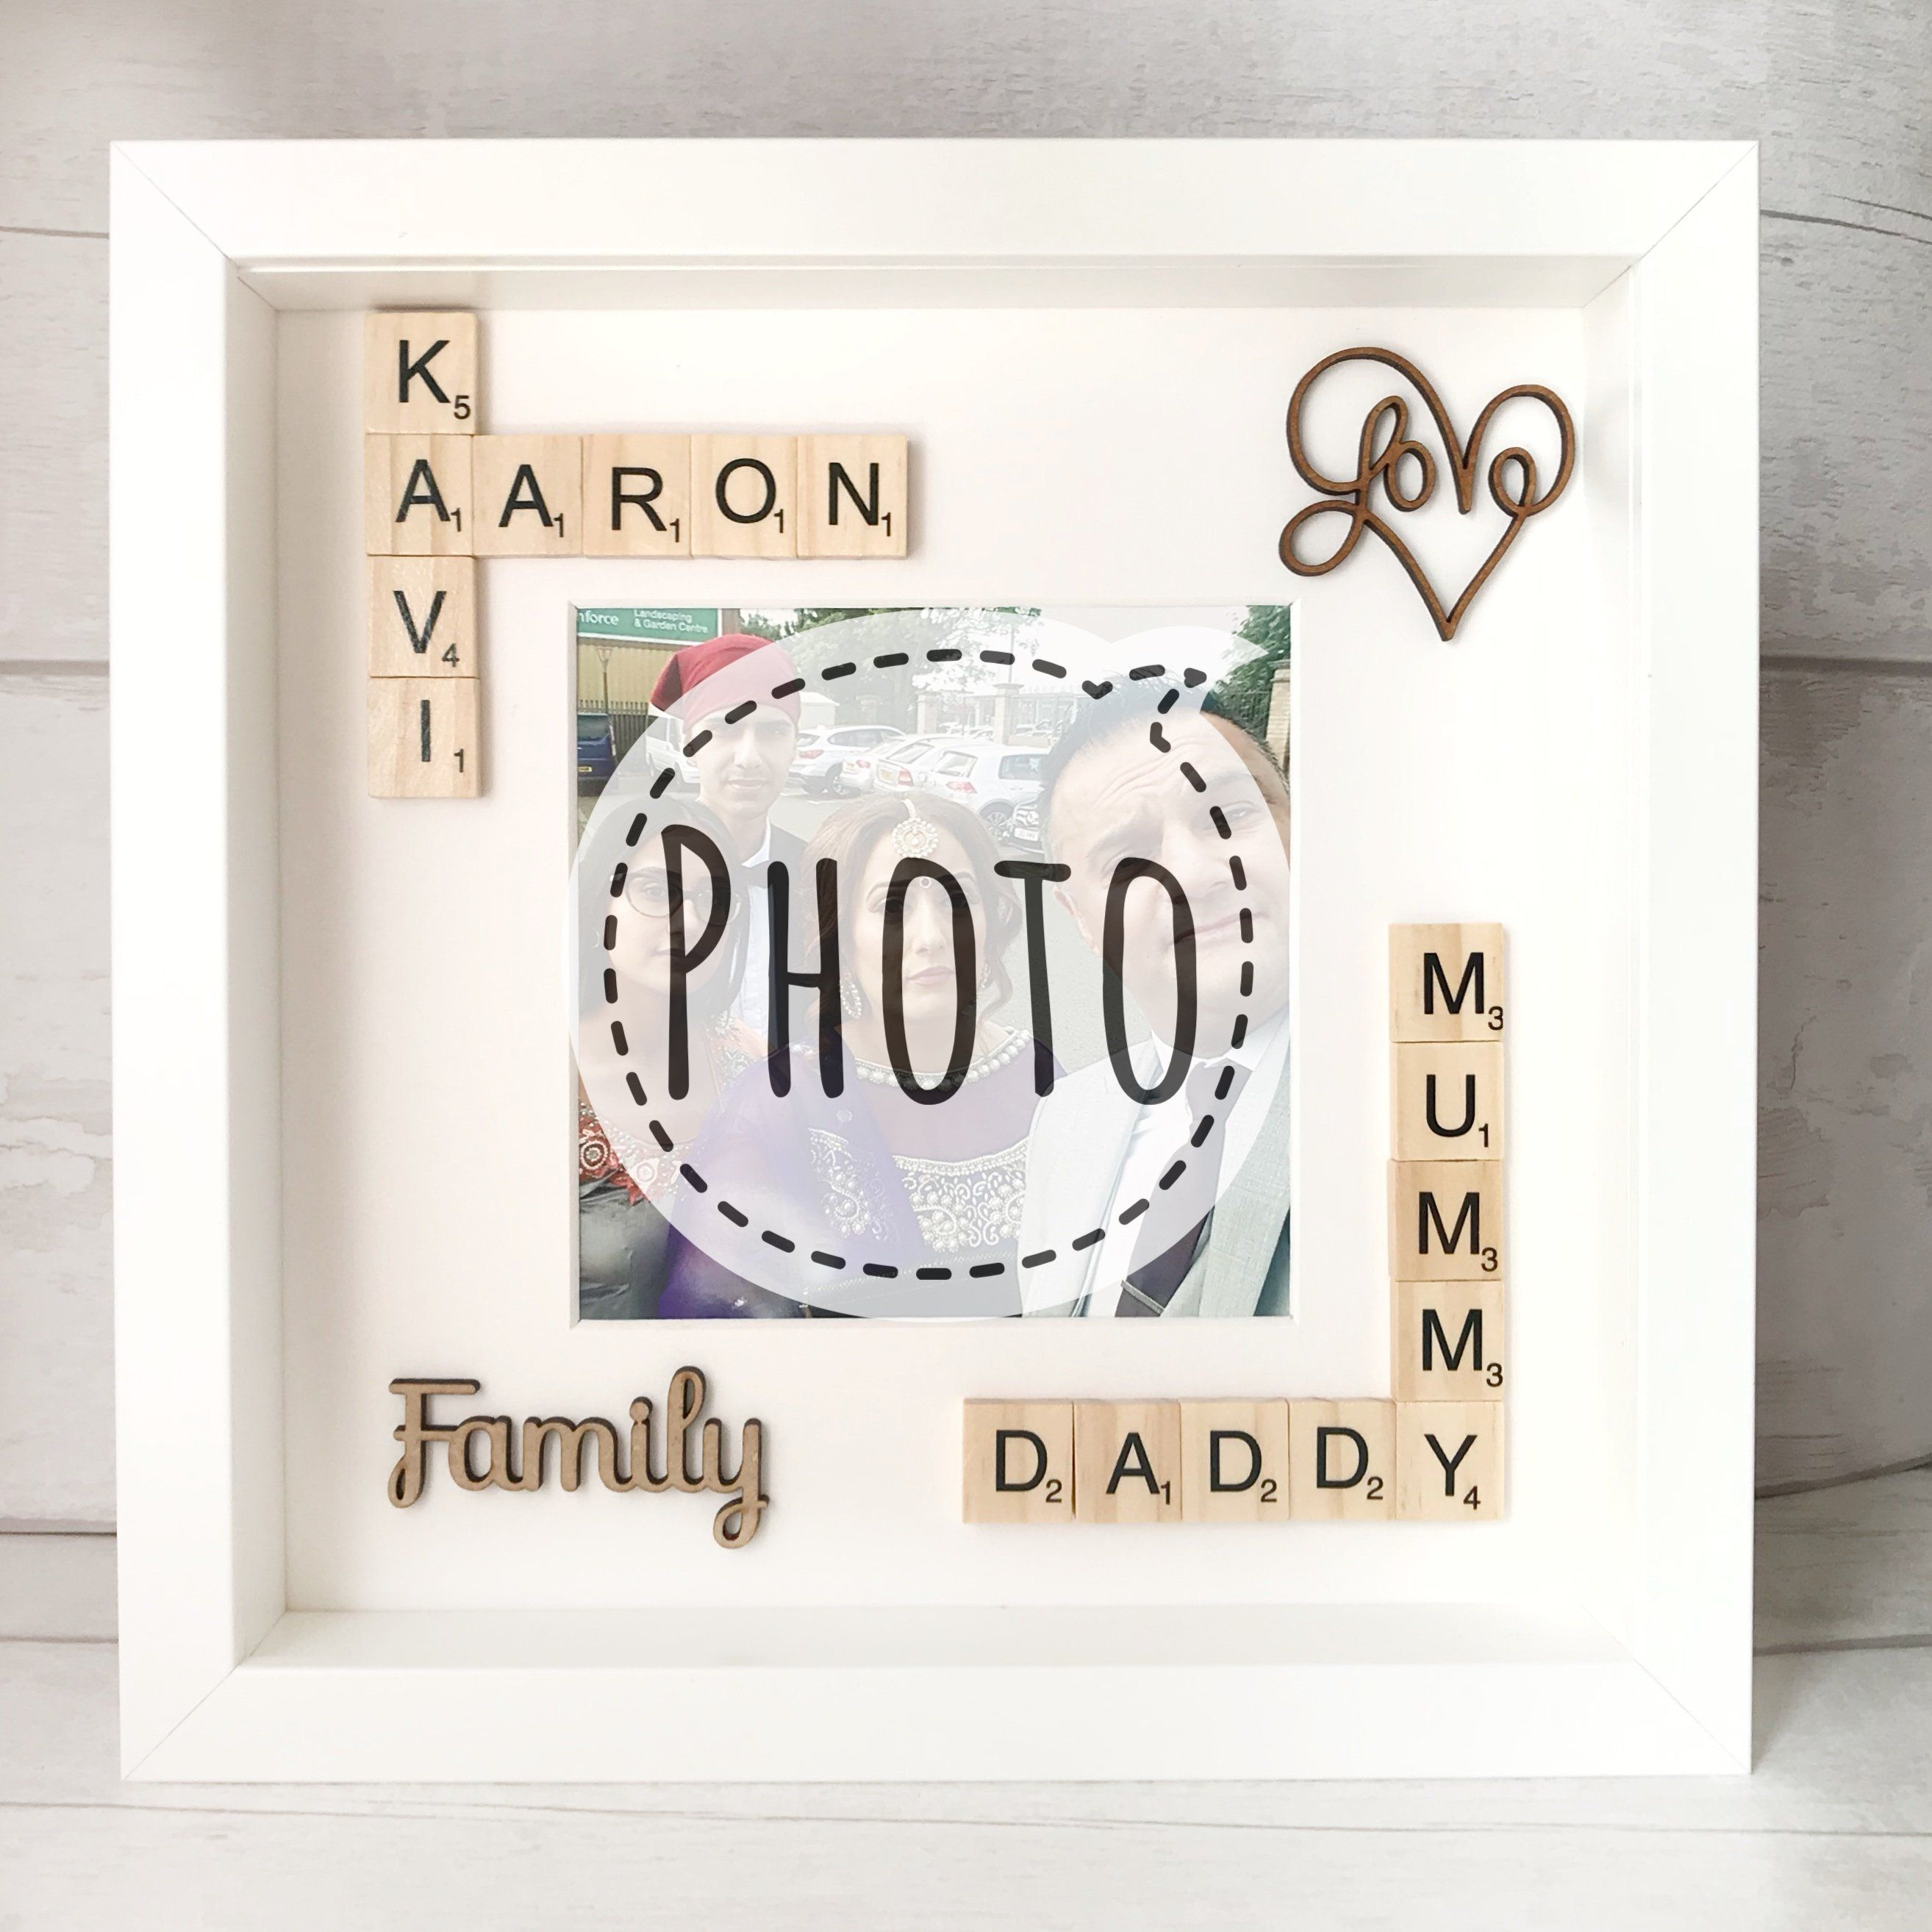 Family Personalised Photo Frame Gift Photo Frame Gift For Parents Love This Photo Frame Gift Idea Photo Frame Gift Personalized Photo Frames Photo Frame